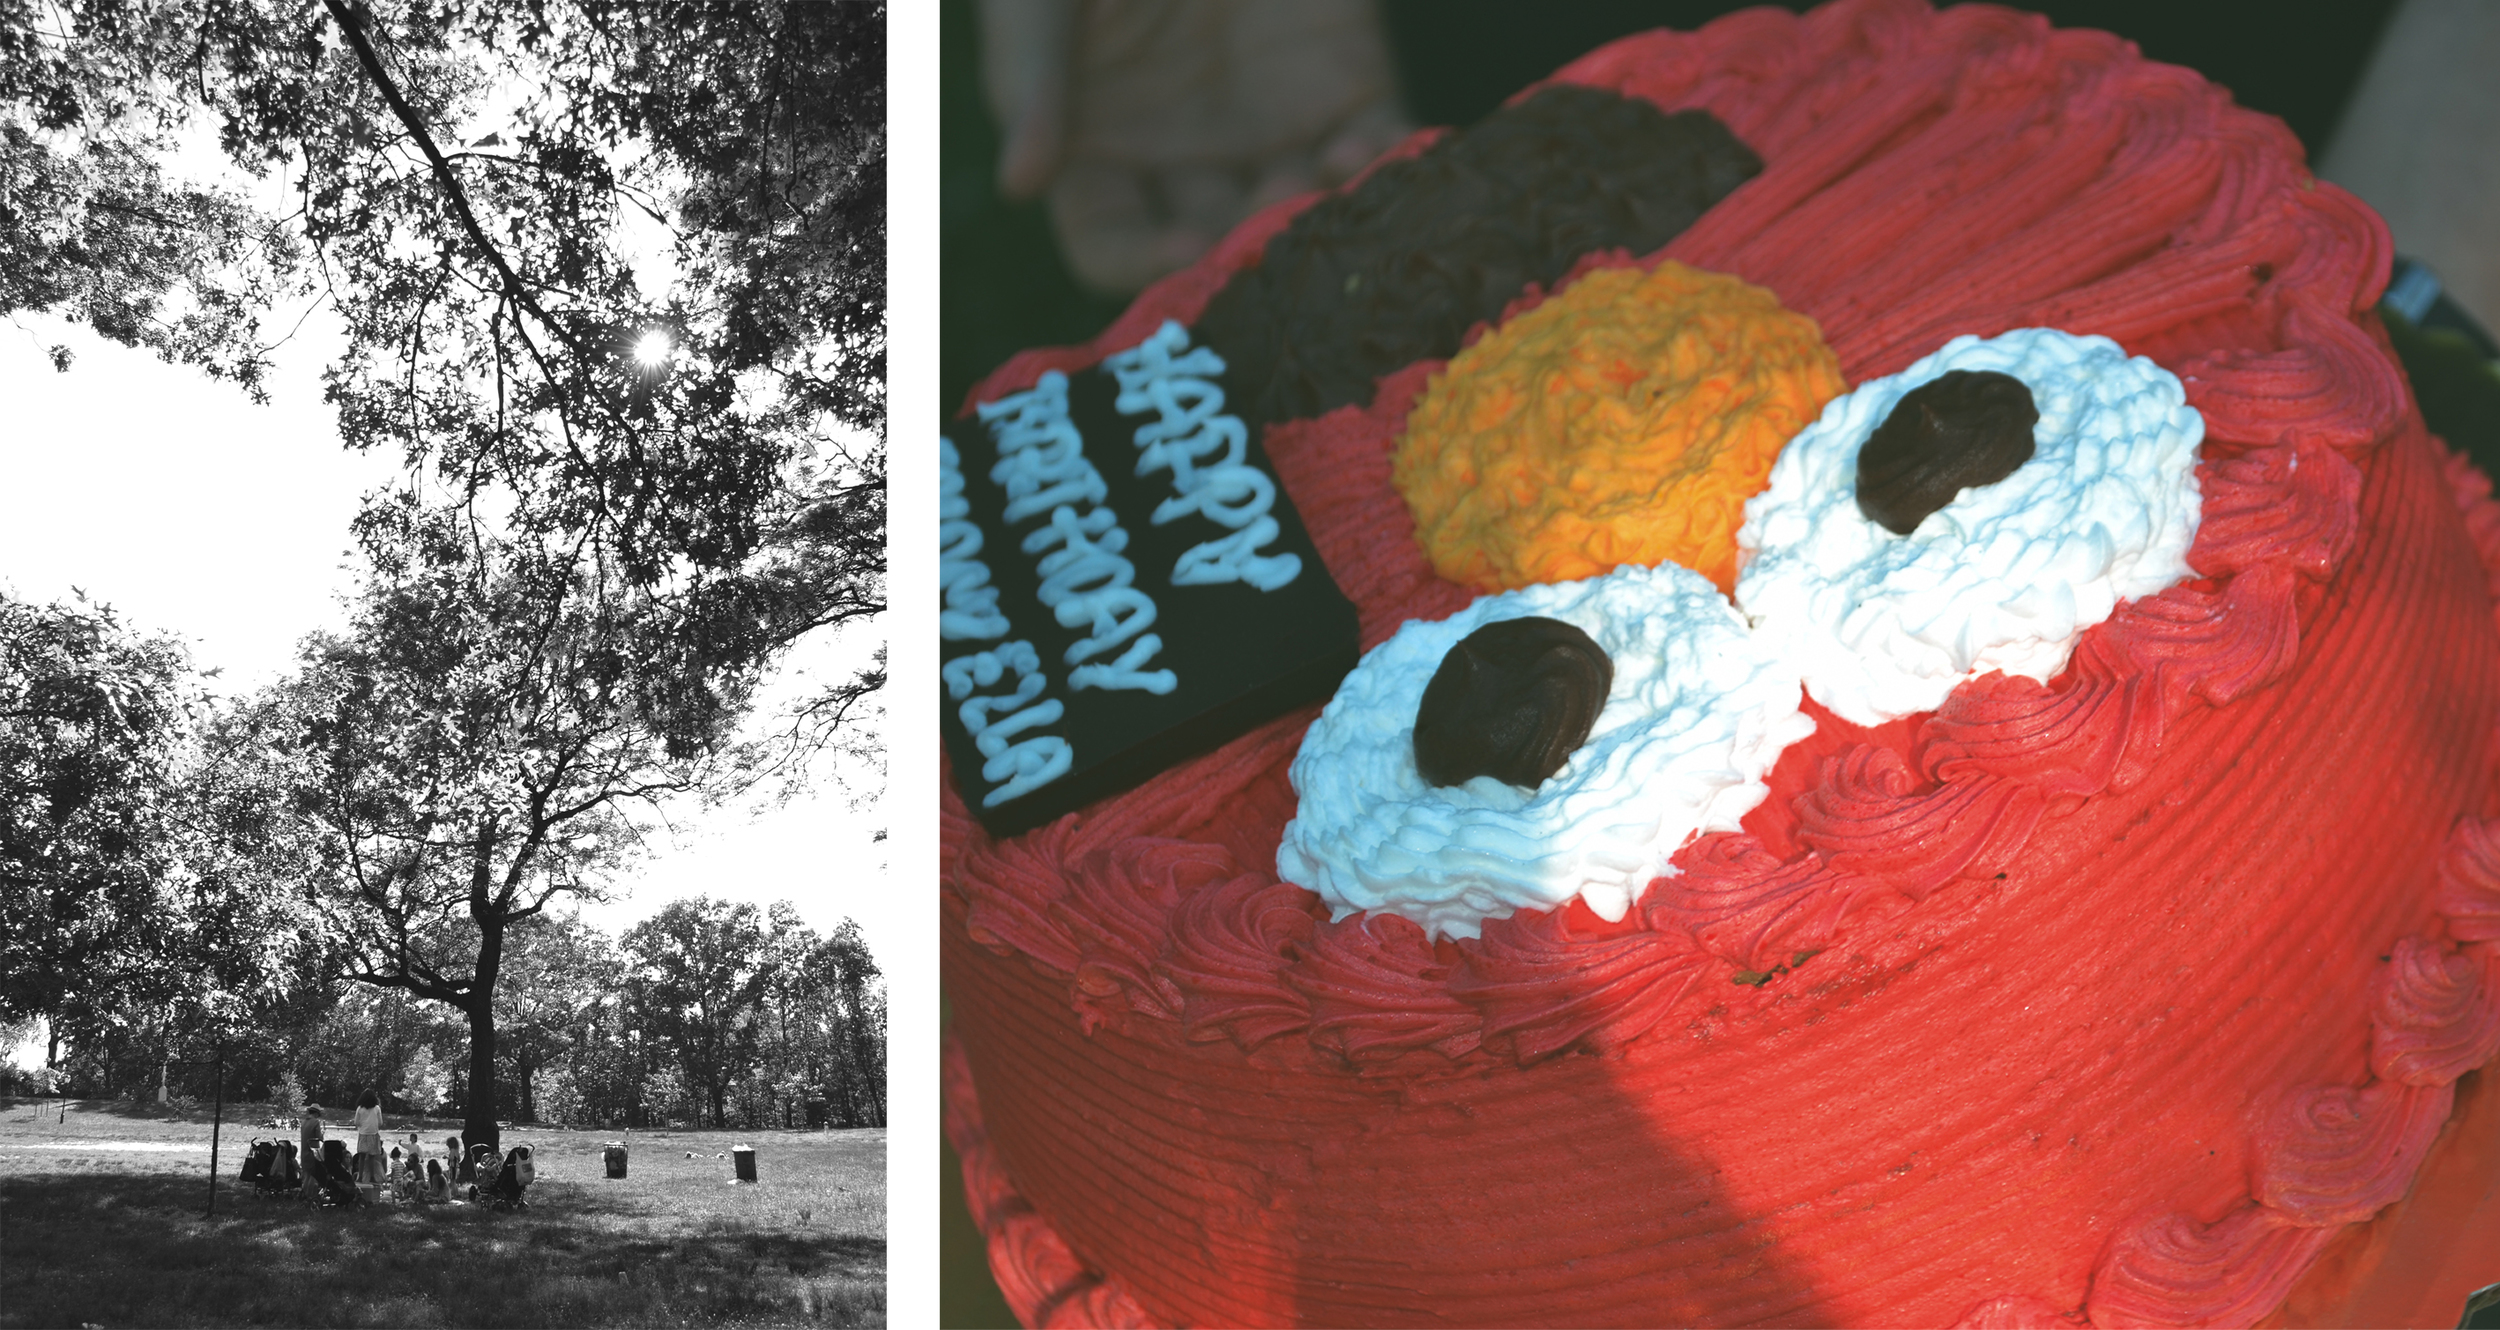 Emanuella's 2nd birthdayin the park